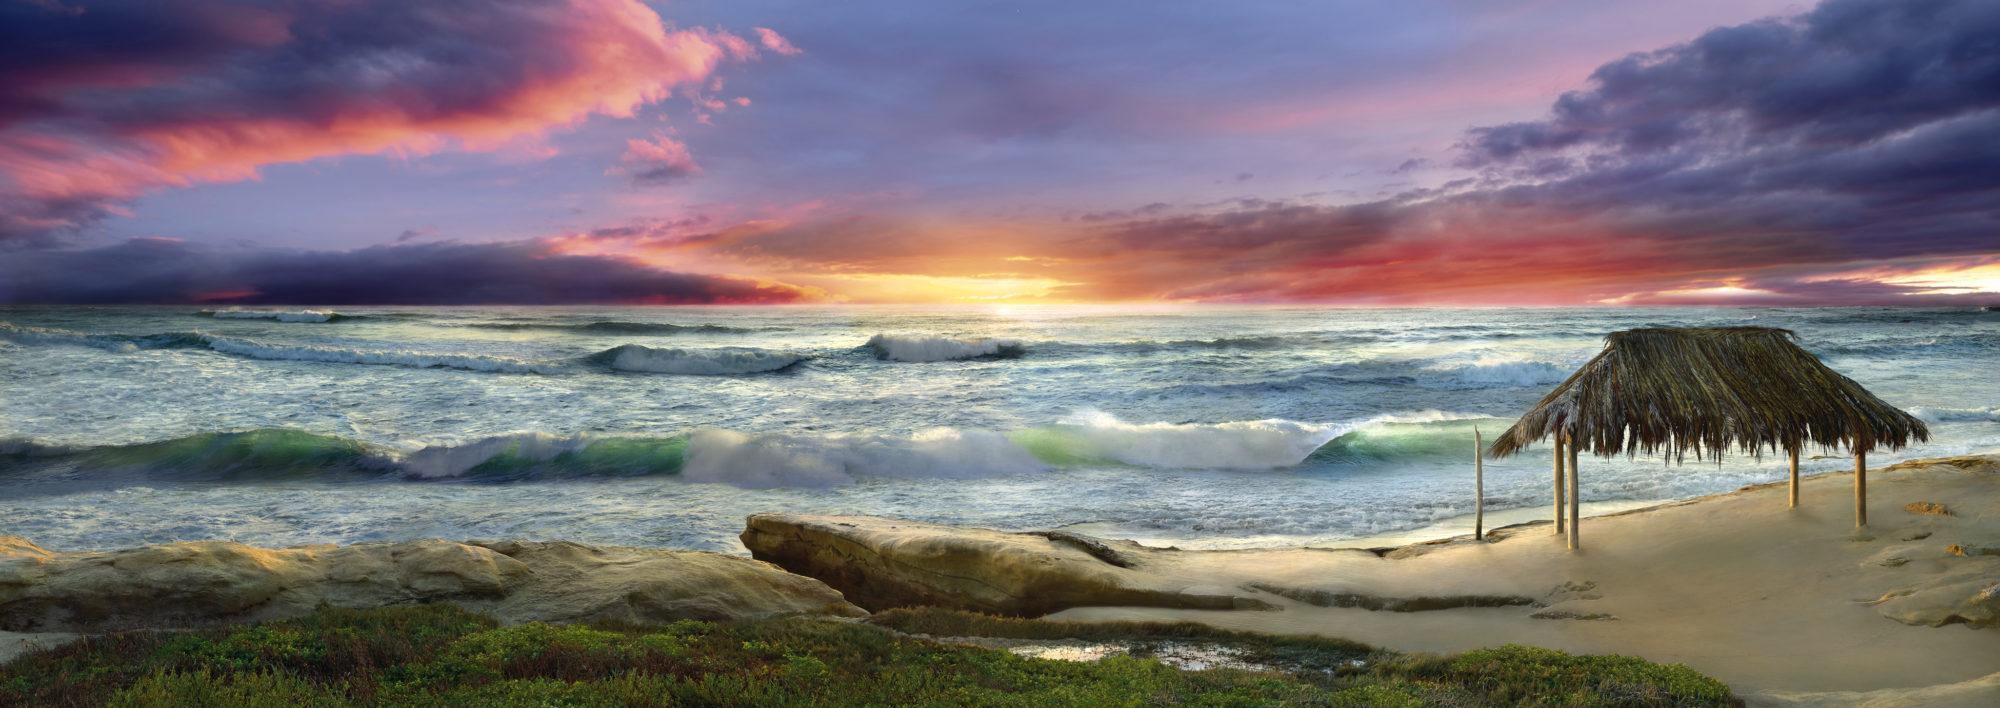 Surfshack_RGB_Hompage-2000x708.jpg